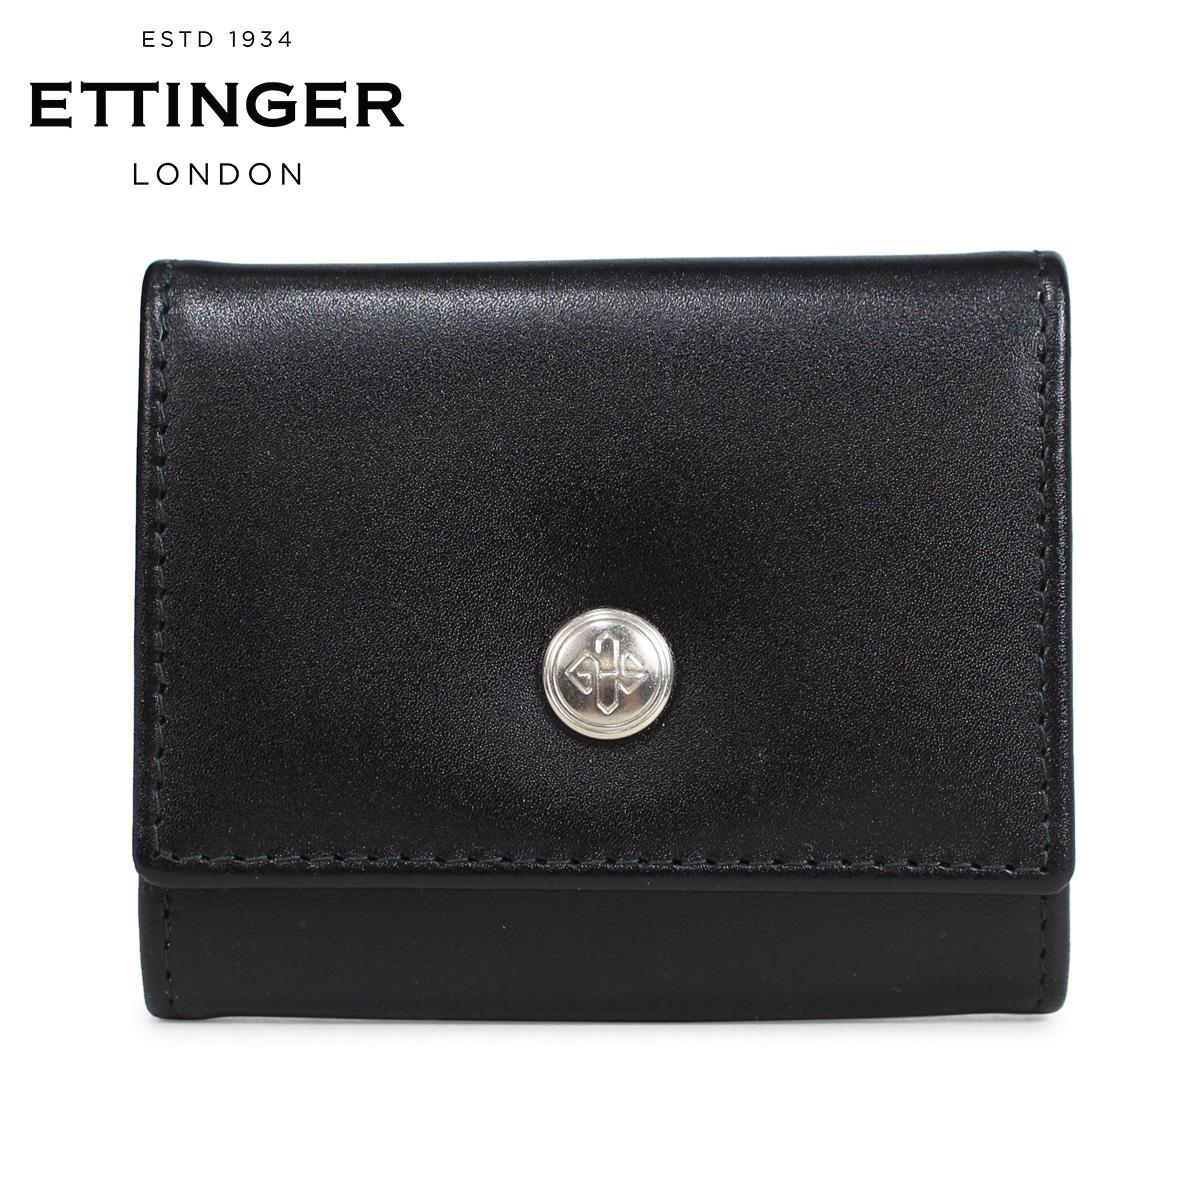 ETTINGER STERLING COIN PURSE WITH CARD POCKET エッティンガー 財布 コインケース 小銭入れ メンズ 本革 ブラック ST145JR